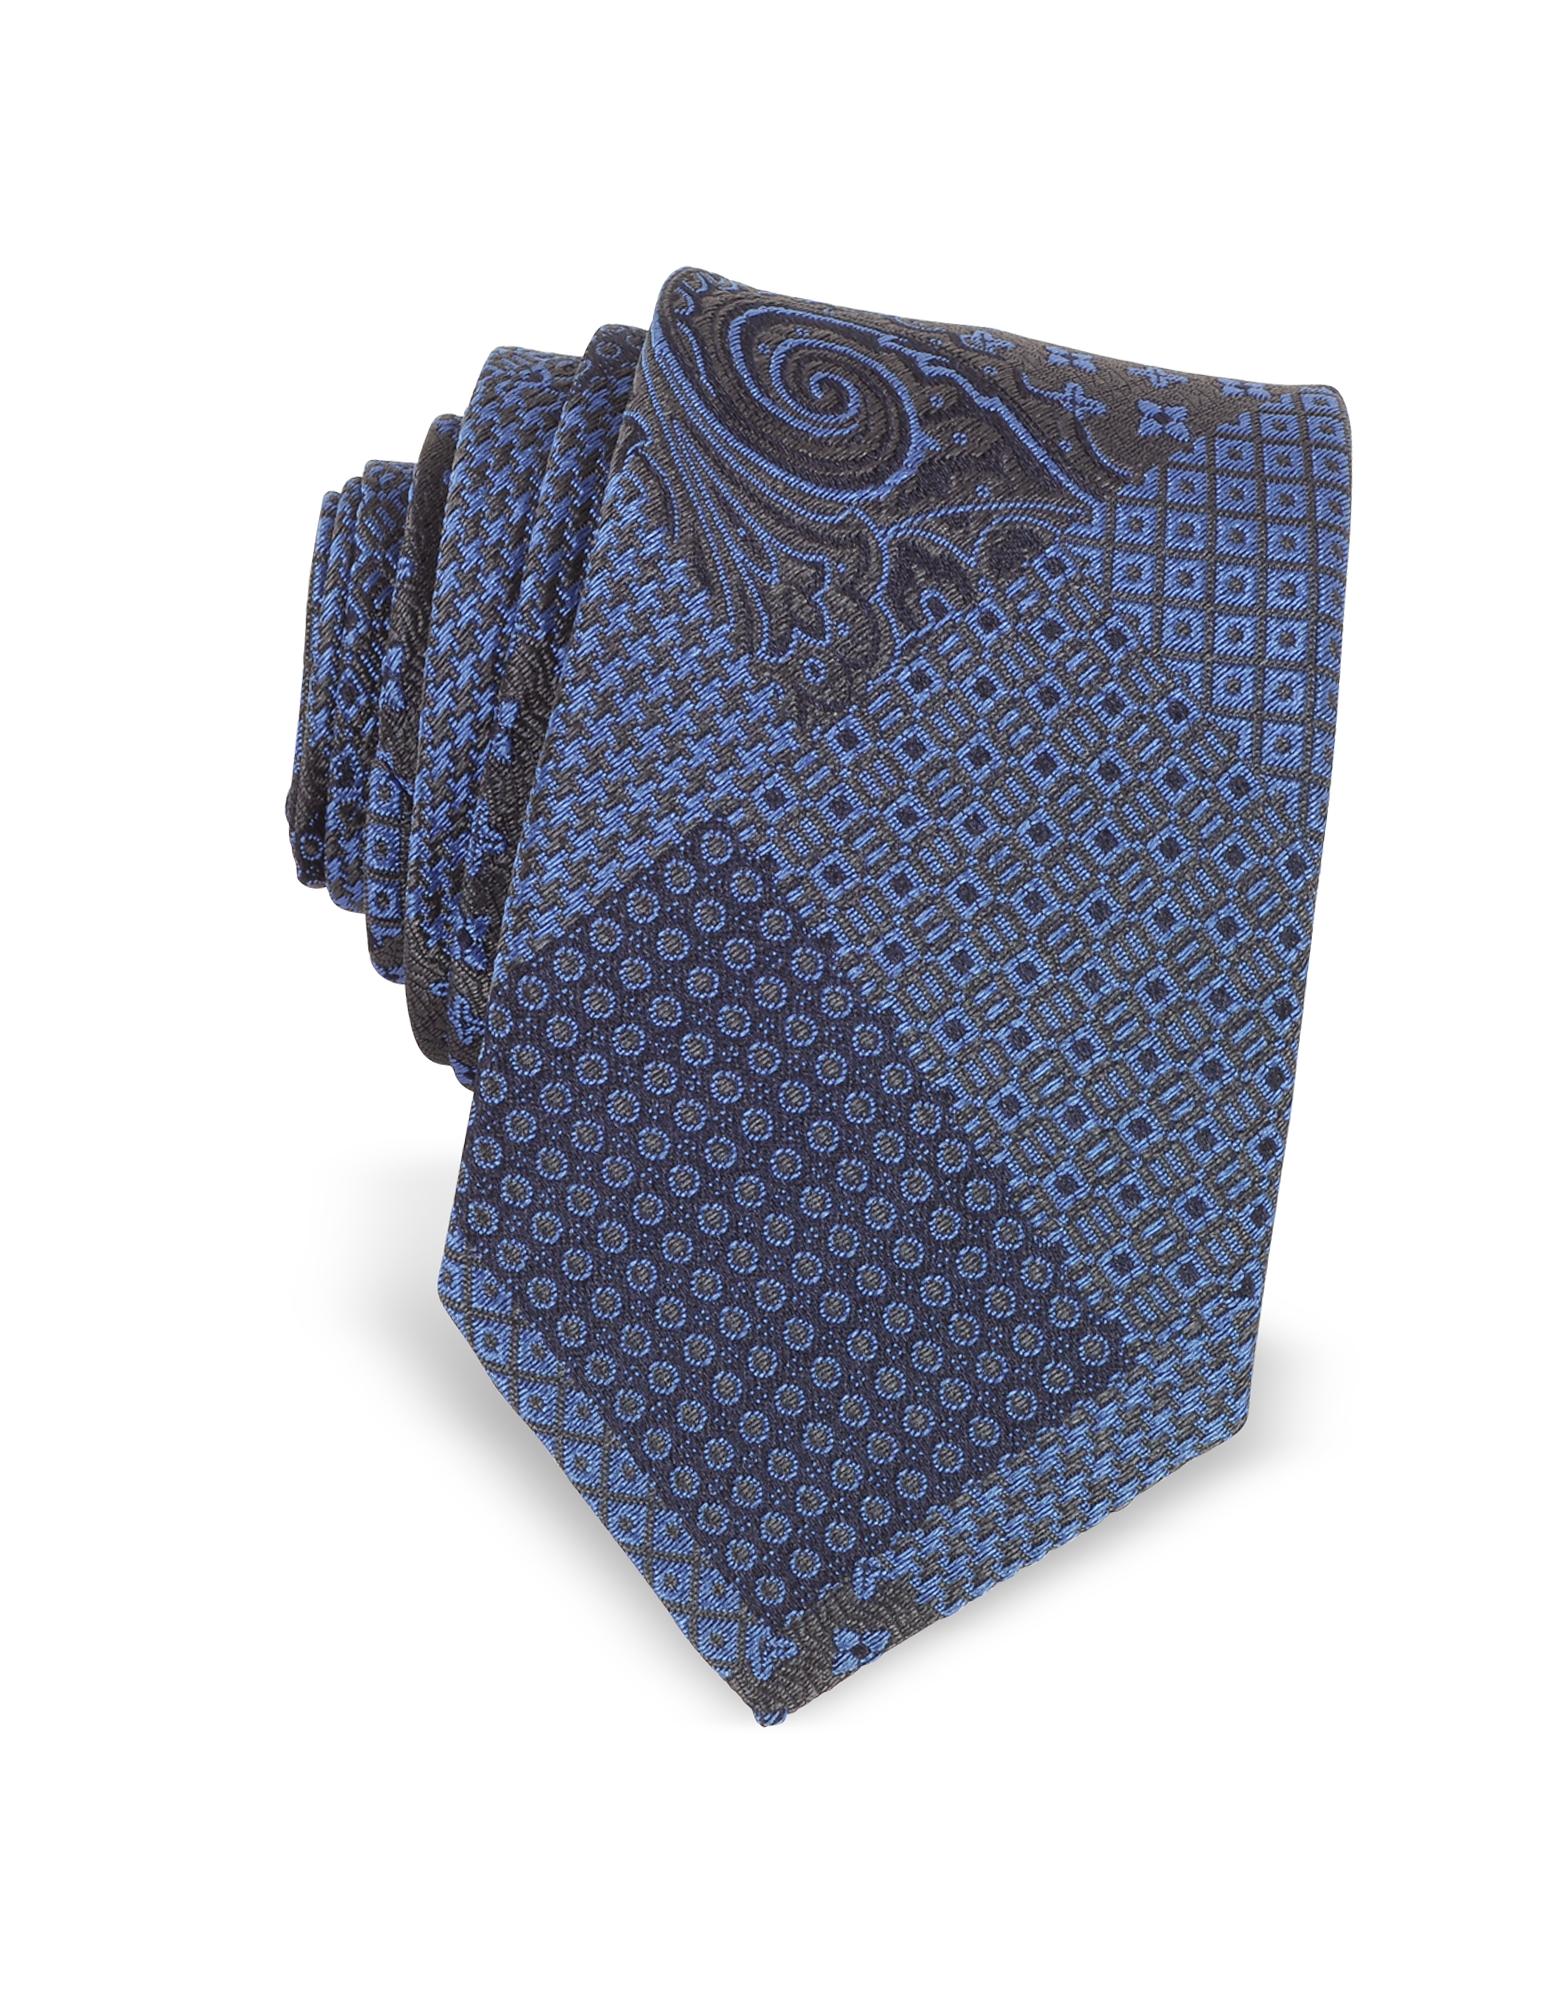 Forzieri Ties, Patchwork Woven Silk Narrow Tie